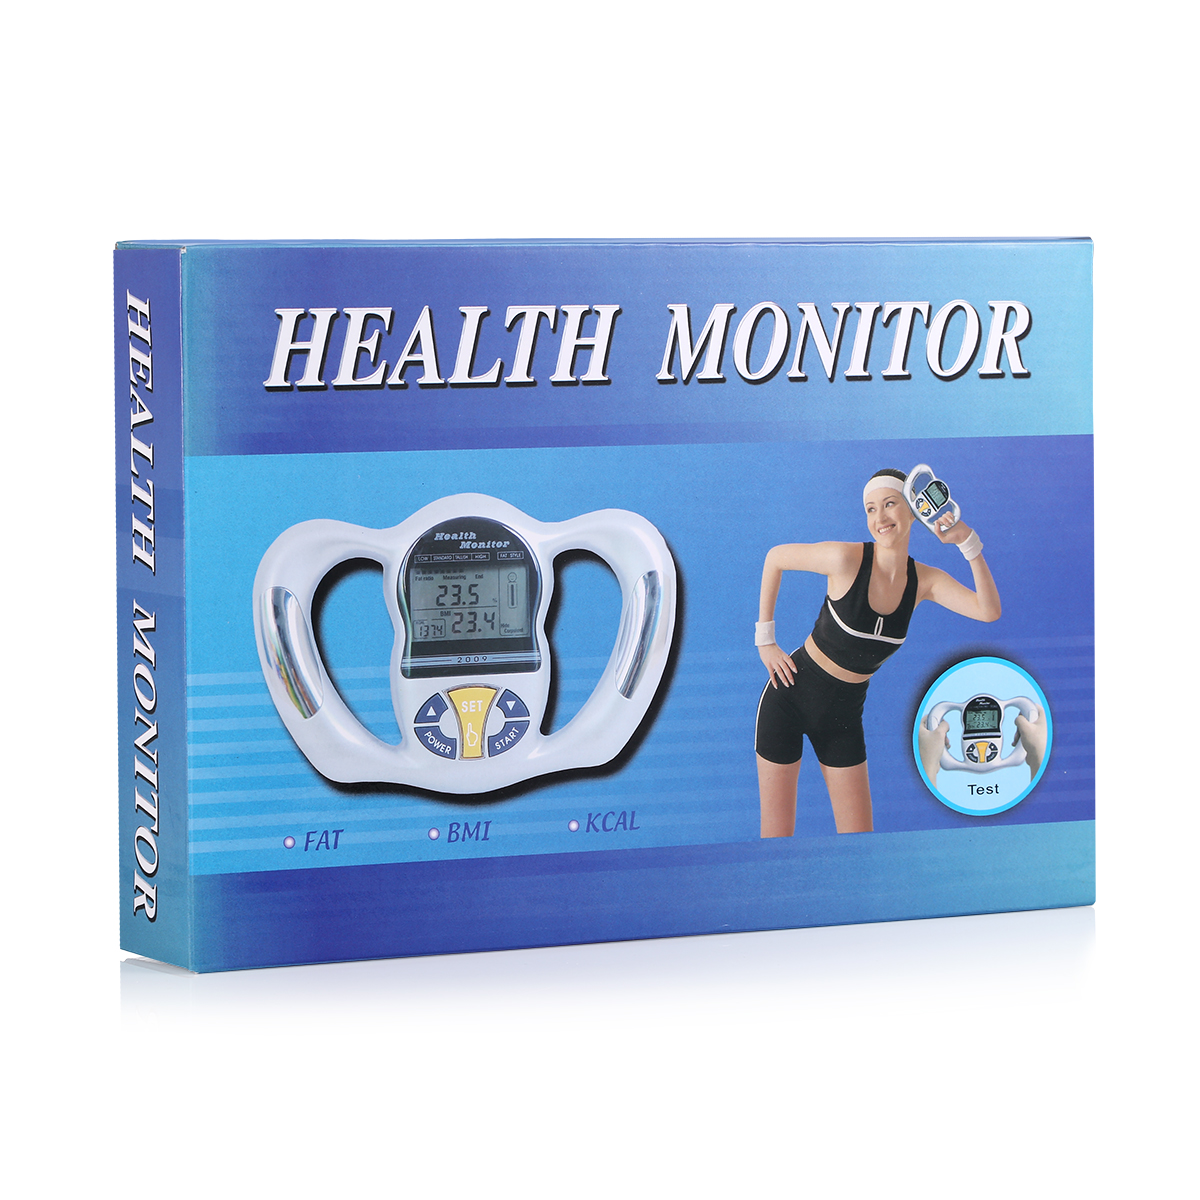 Handheld Body Fat Calculator